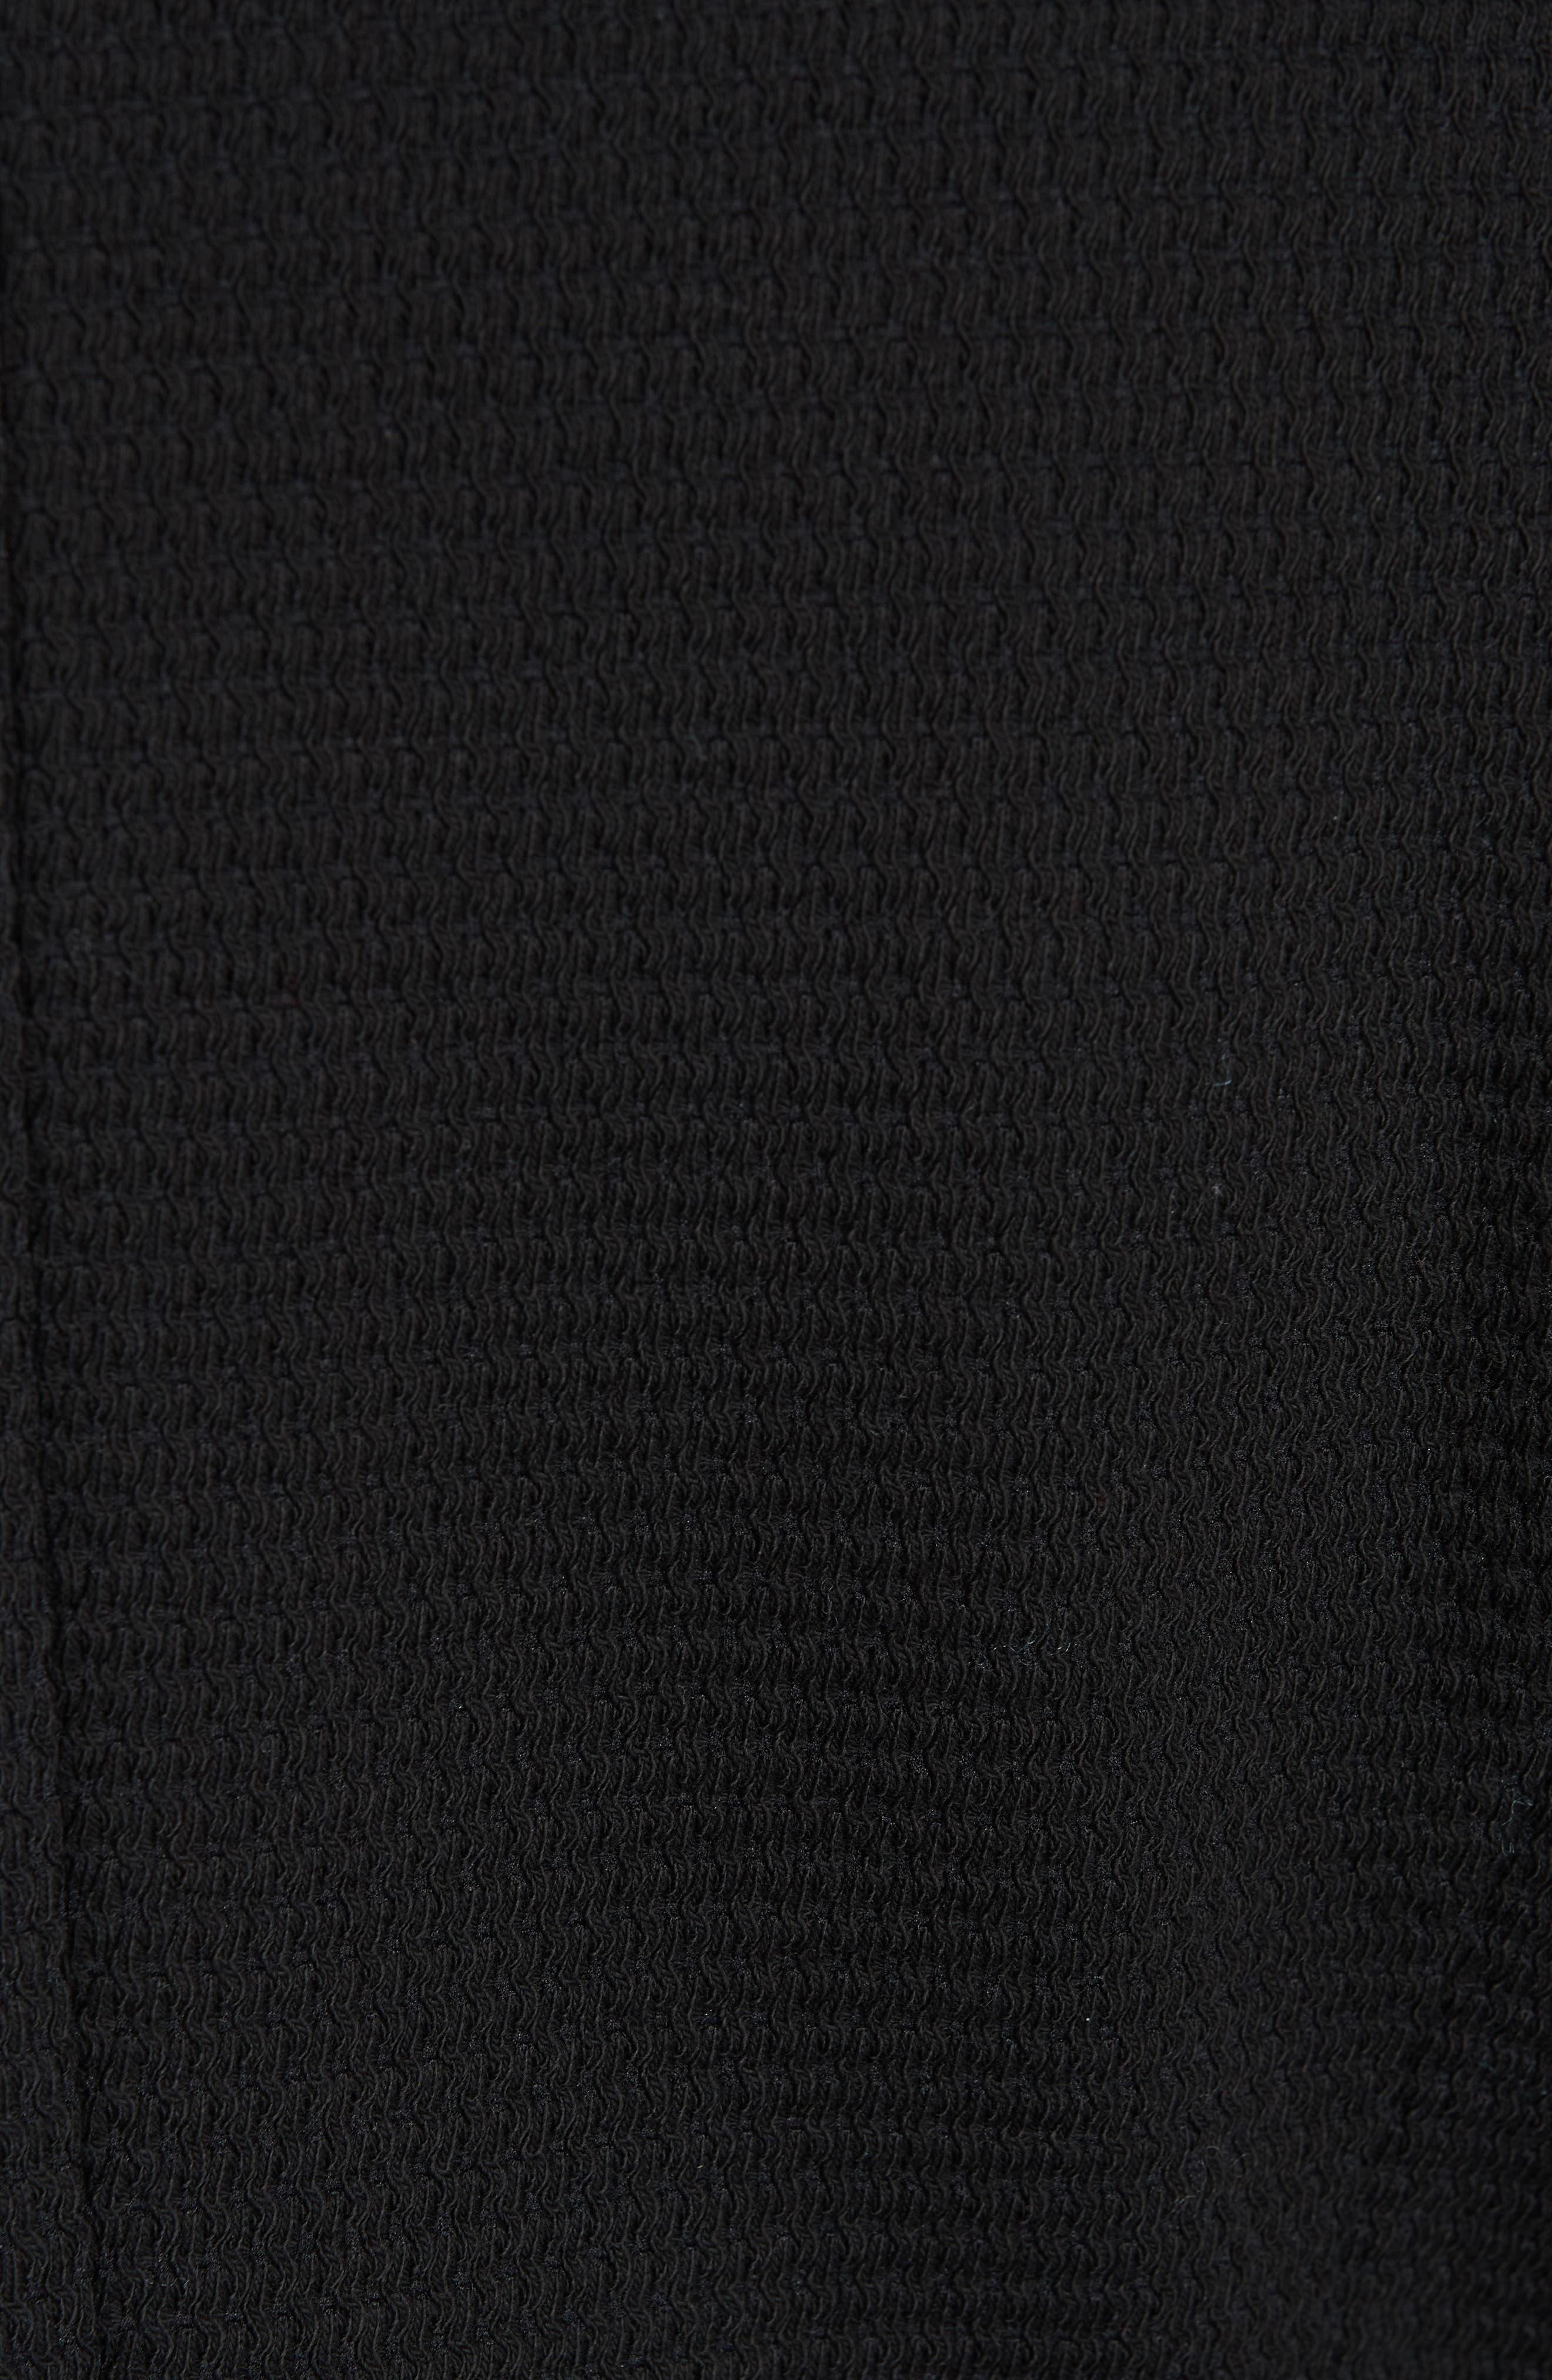 Kemio Textured Jersey Suit Jacket,                             Alternate thumbnail 6, color,                             BLACK